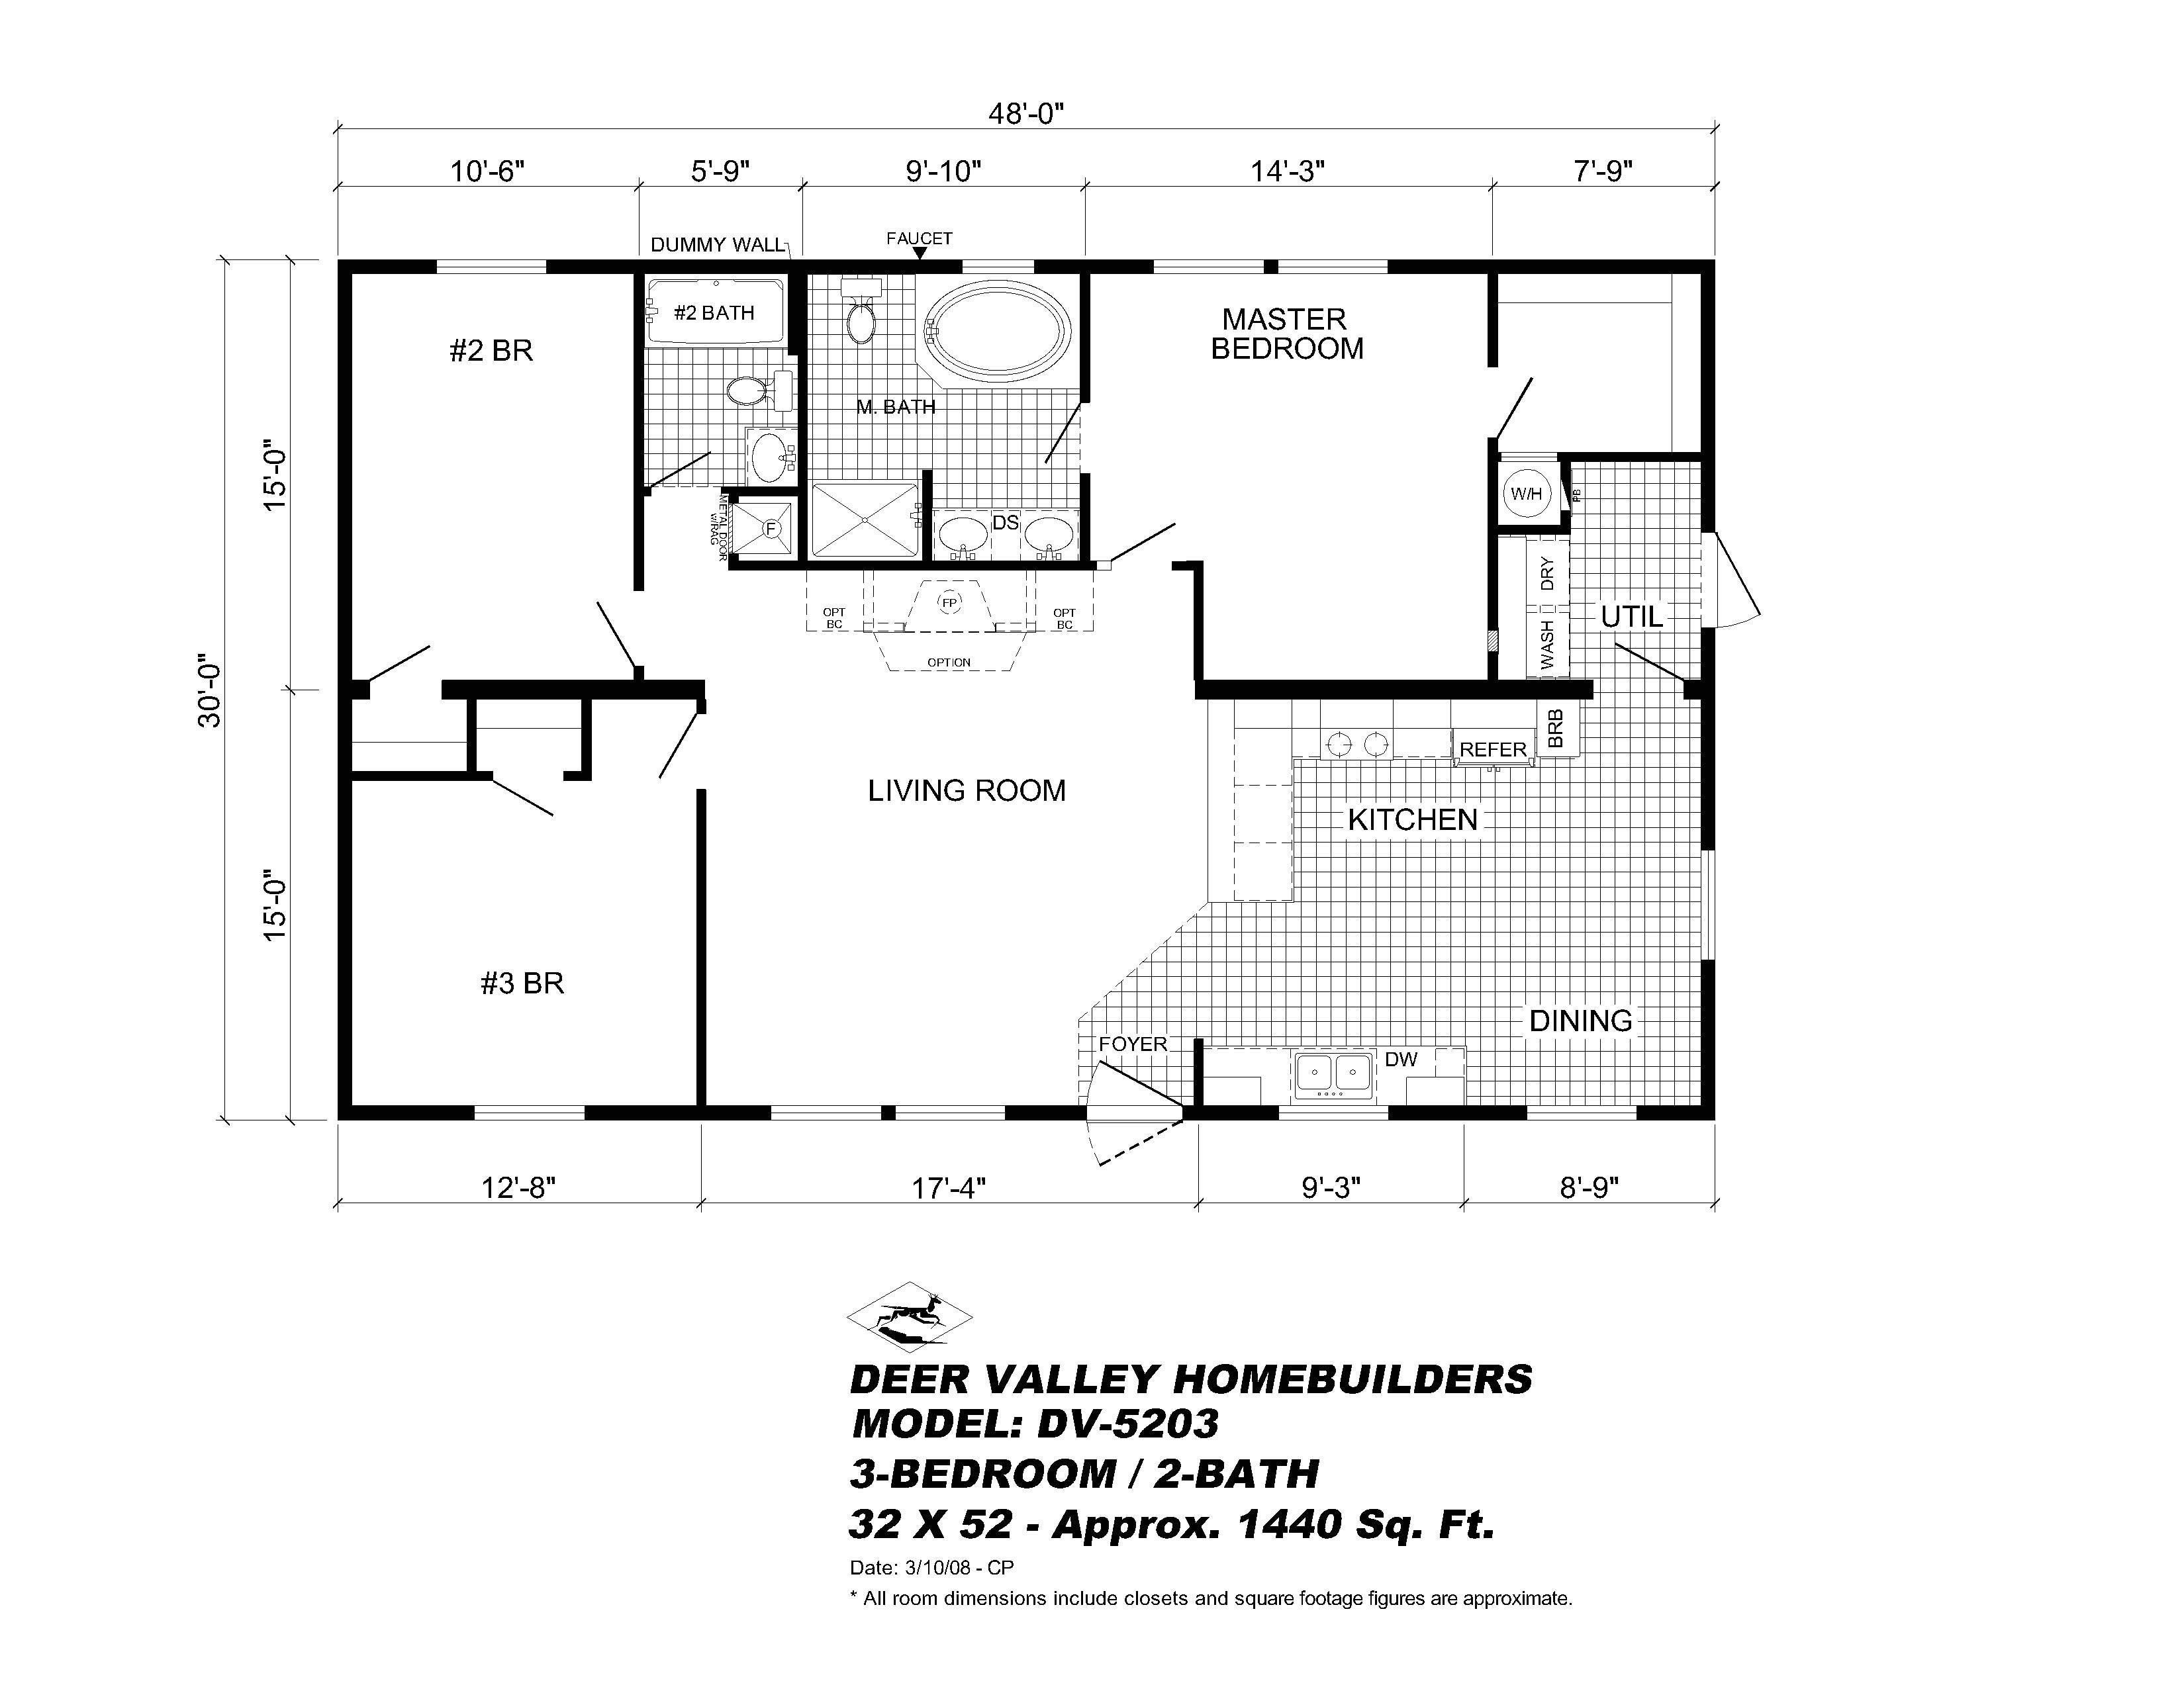 American Home Builders Floor Plans Search Results Carleton Floor Plans Apexwallpapers Com